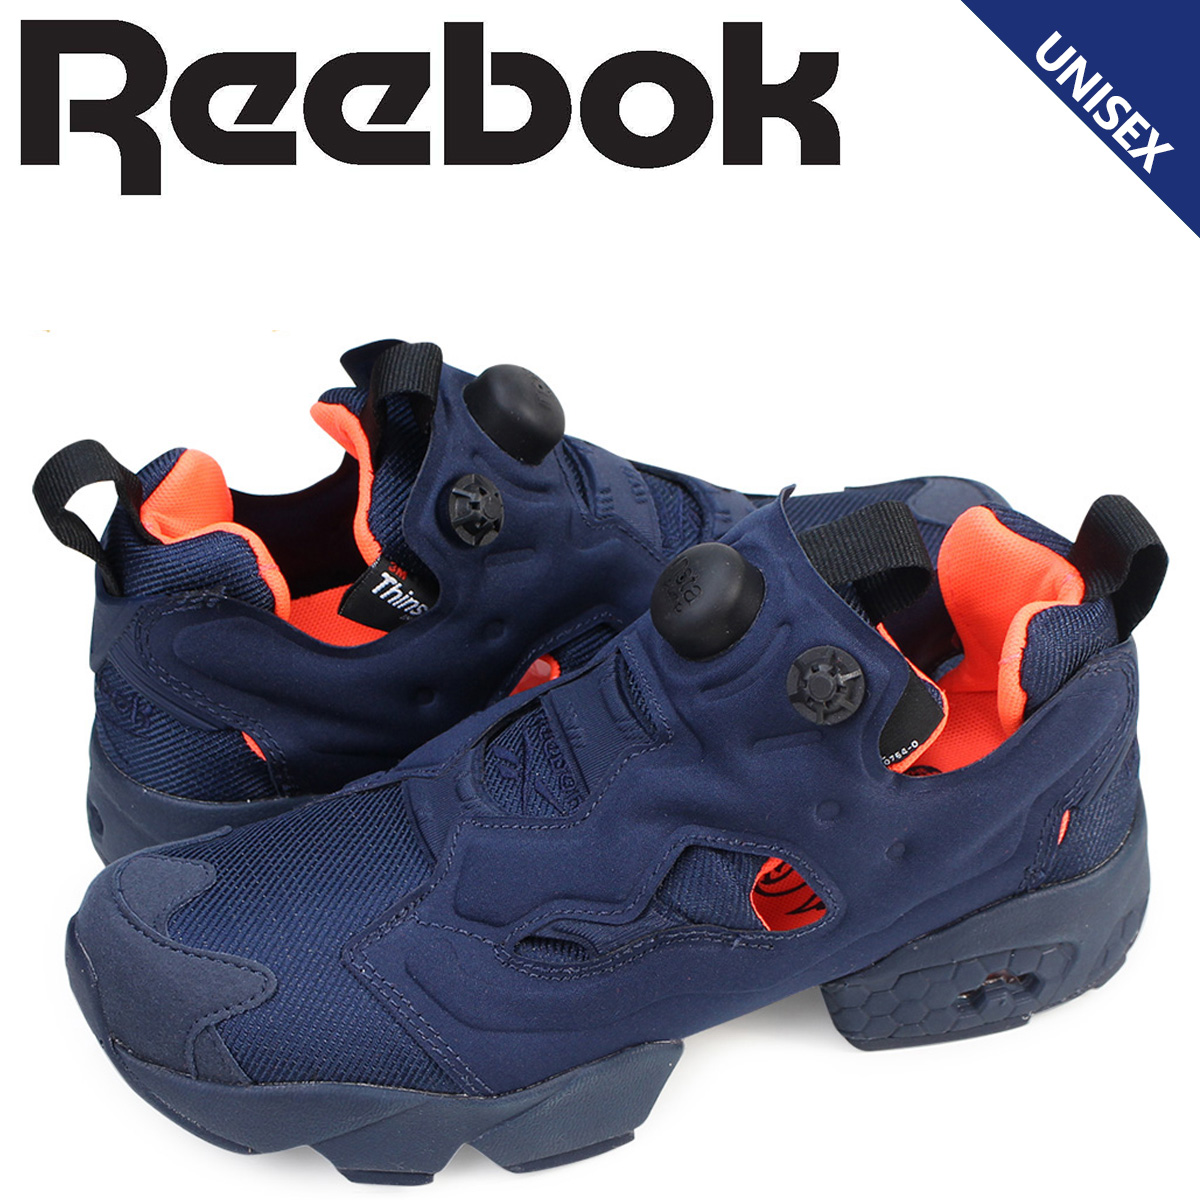 Reebok ポンプフューリー スニーカー リーボック INSTAPUMP FURY TECH メンズ レディース V63499 靴 ネイビー